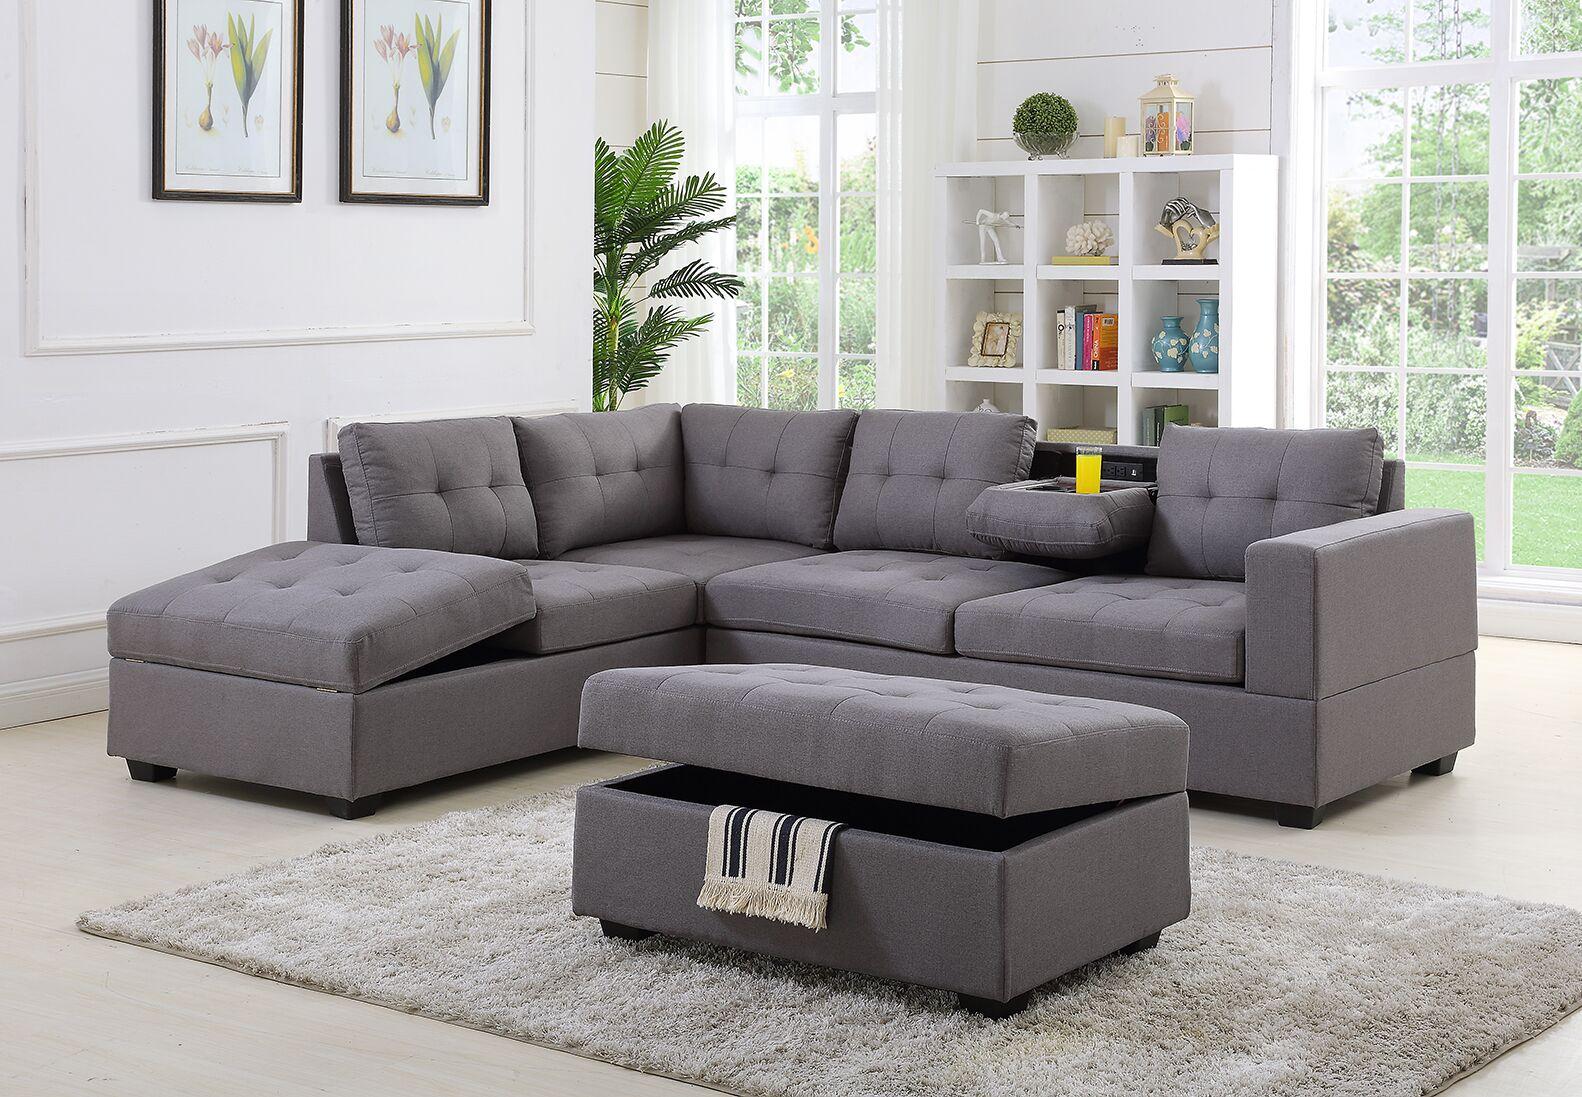 Sofa Sectionnel | Www.gradschoolfairs tout Sofa Pas Cher Montreal